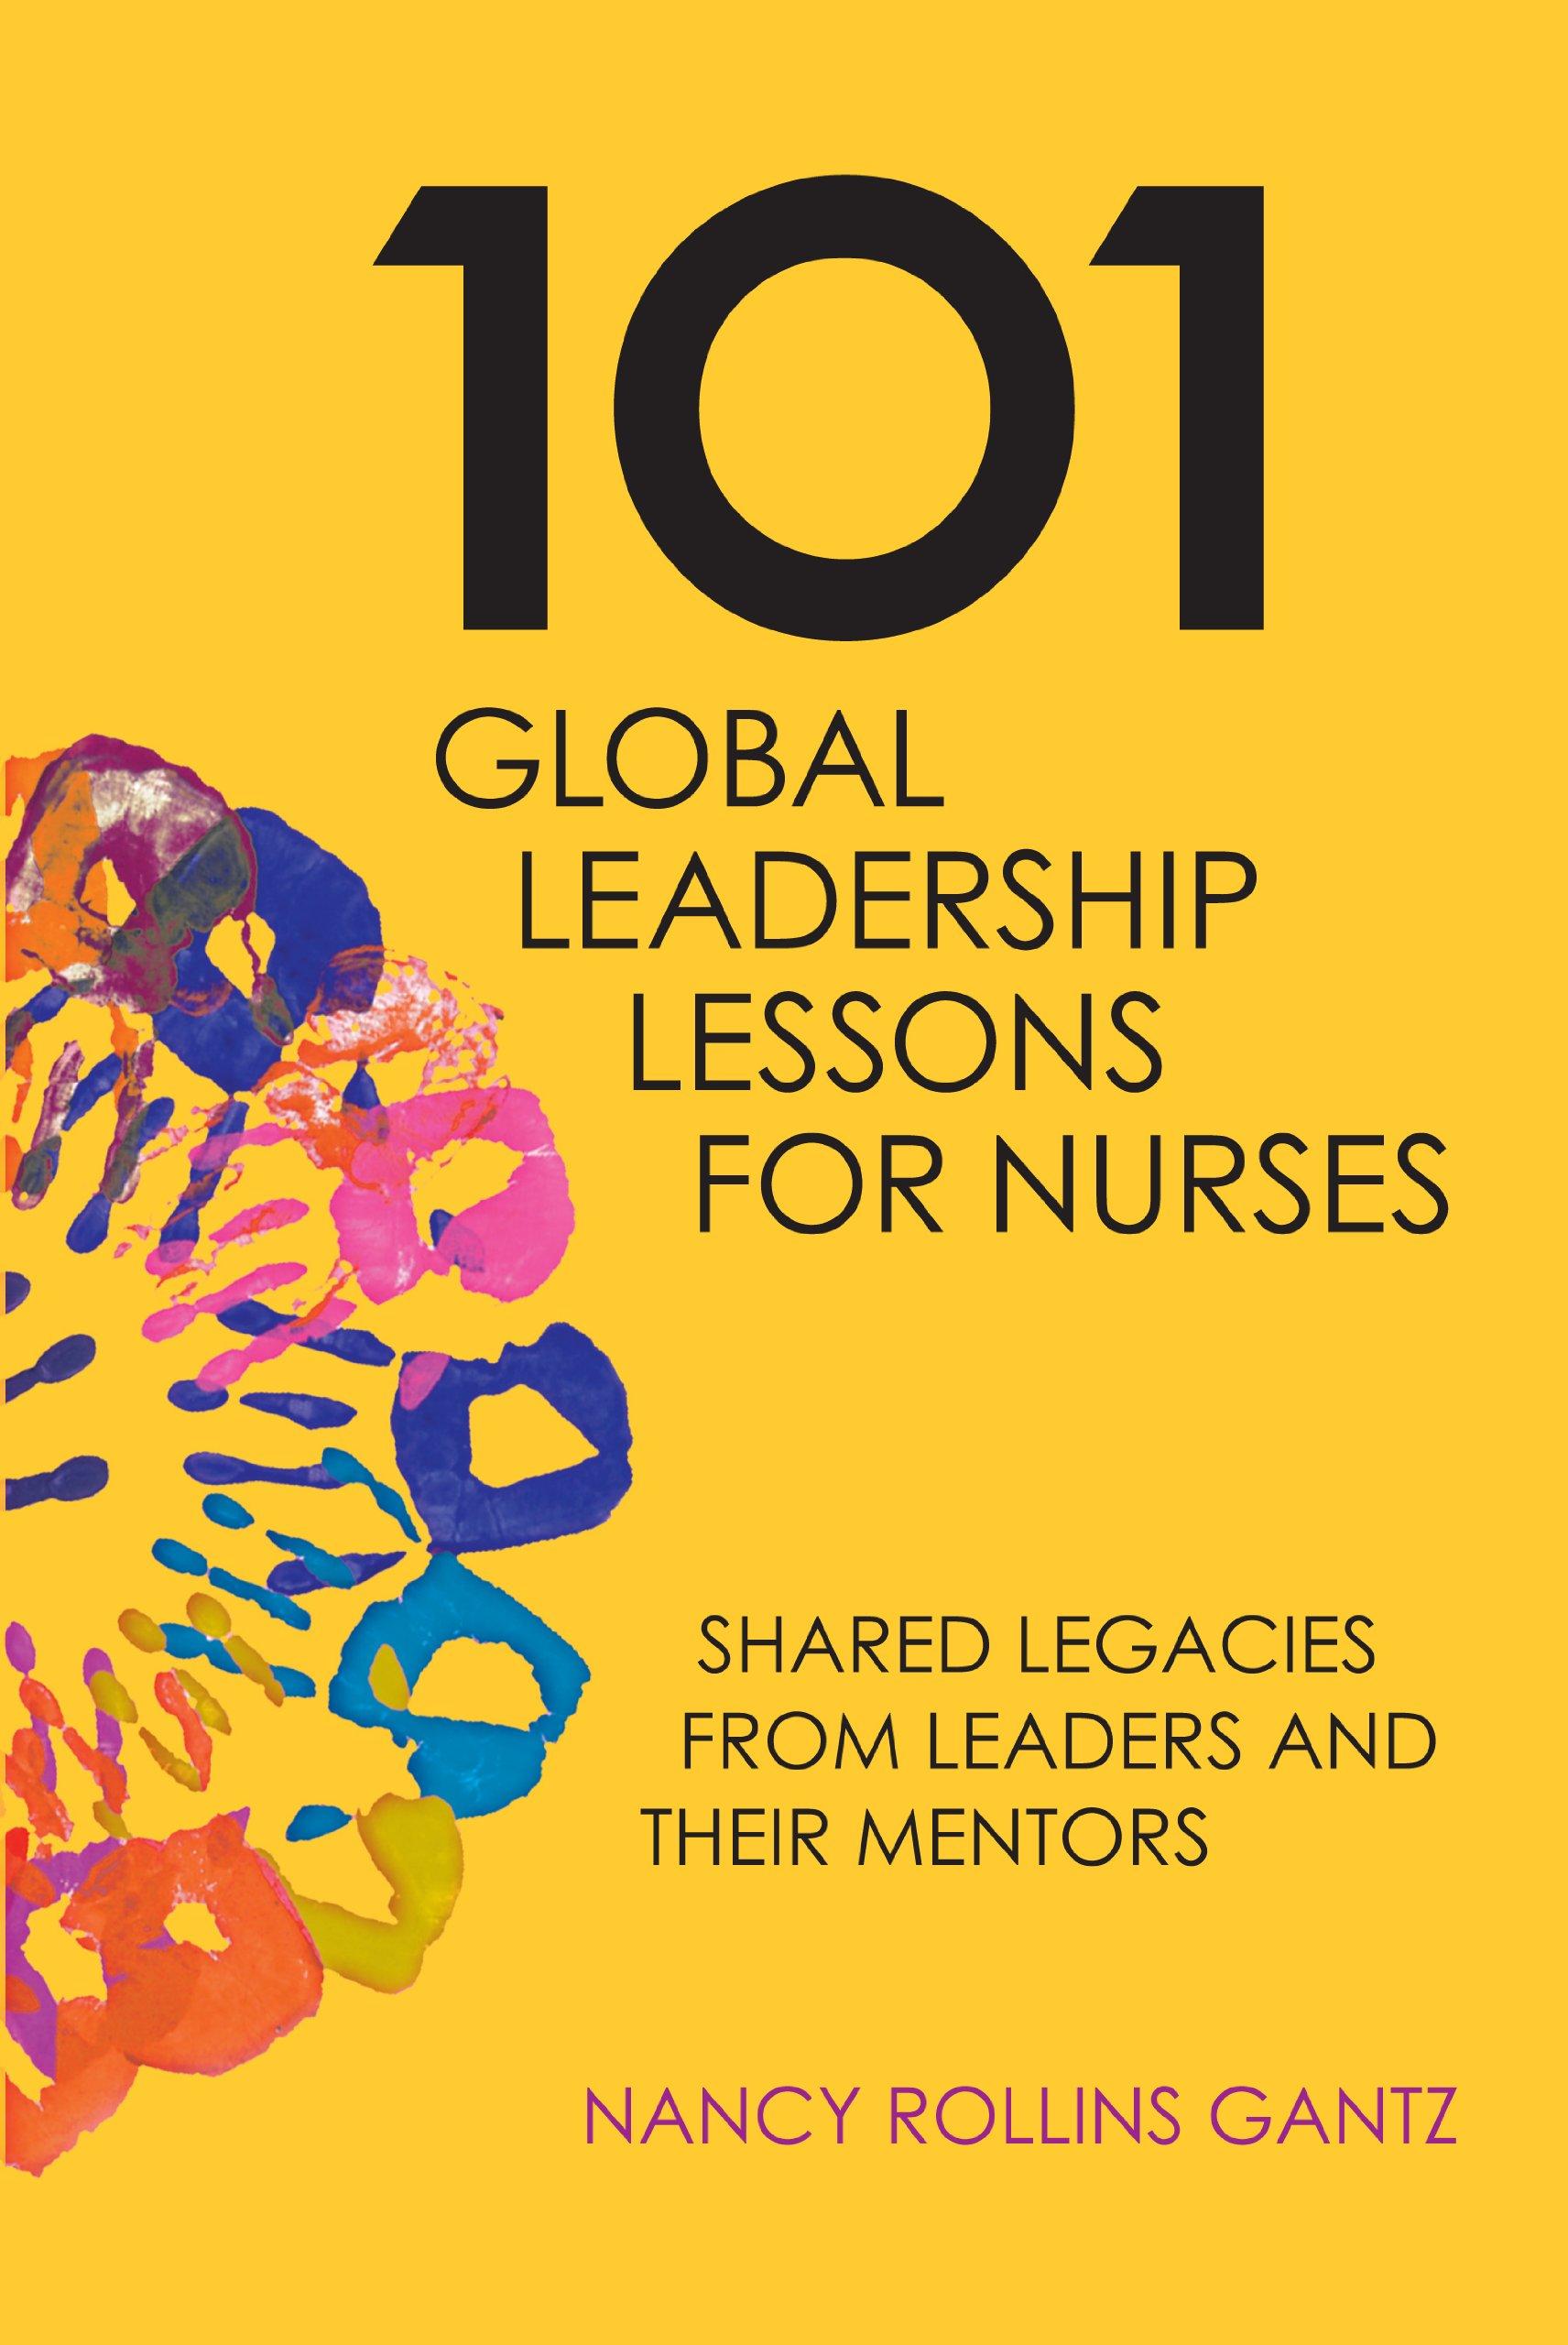 101 Global Leadership Lessons for Nurses: Nancy Rollins: 9781930538795:  Books - Amazon.ca